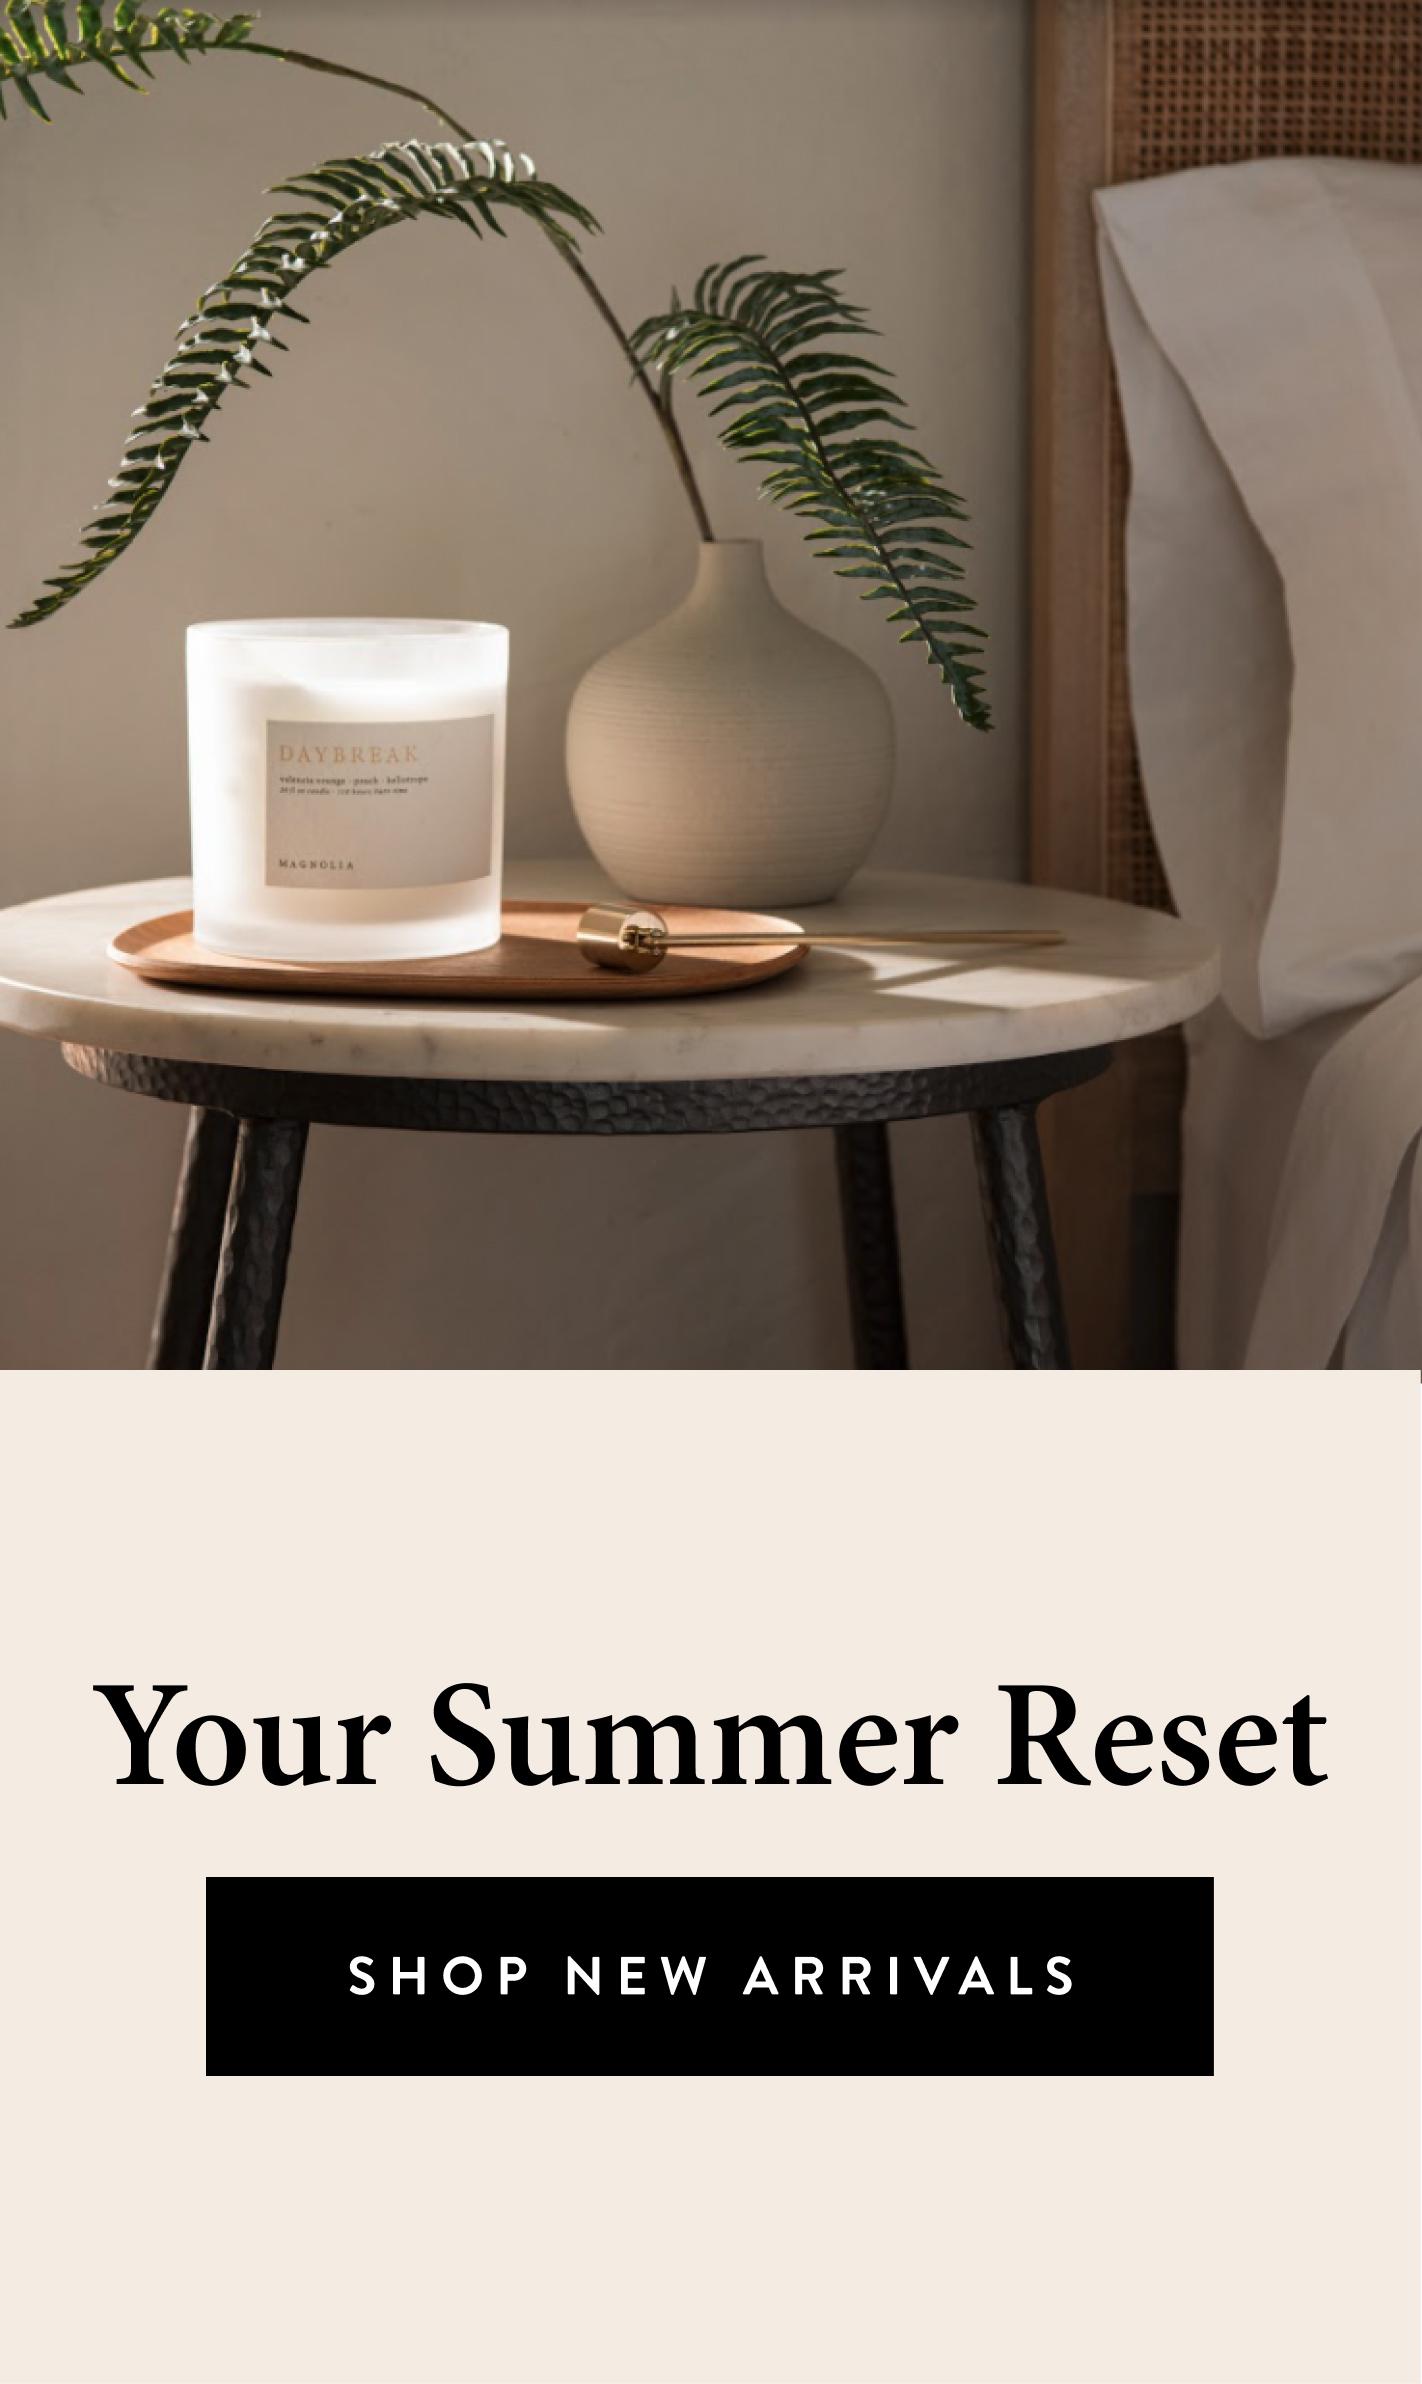 Your Summer Reset Shop new arrivals